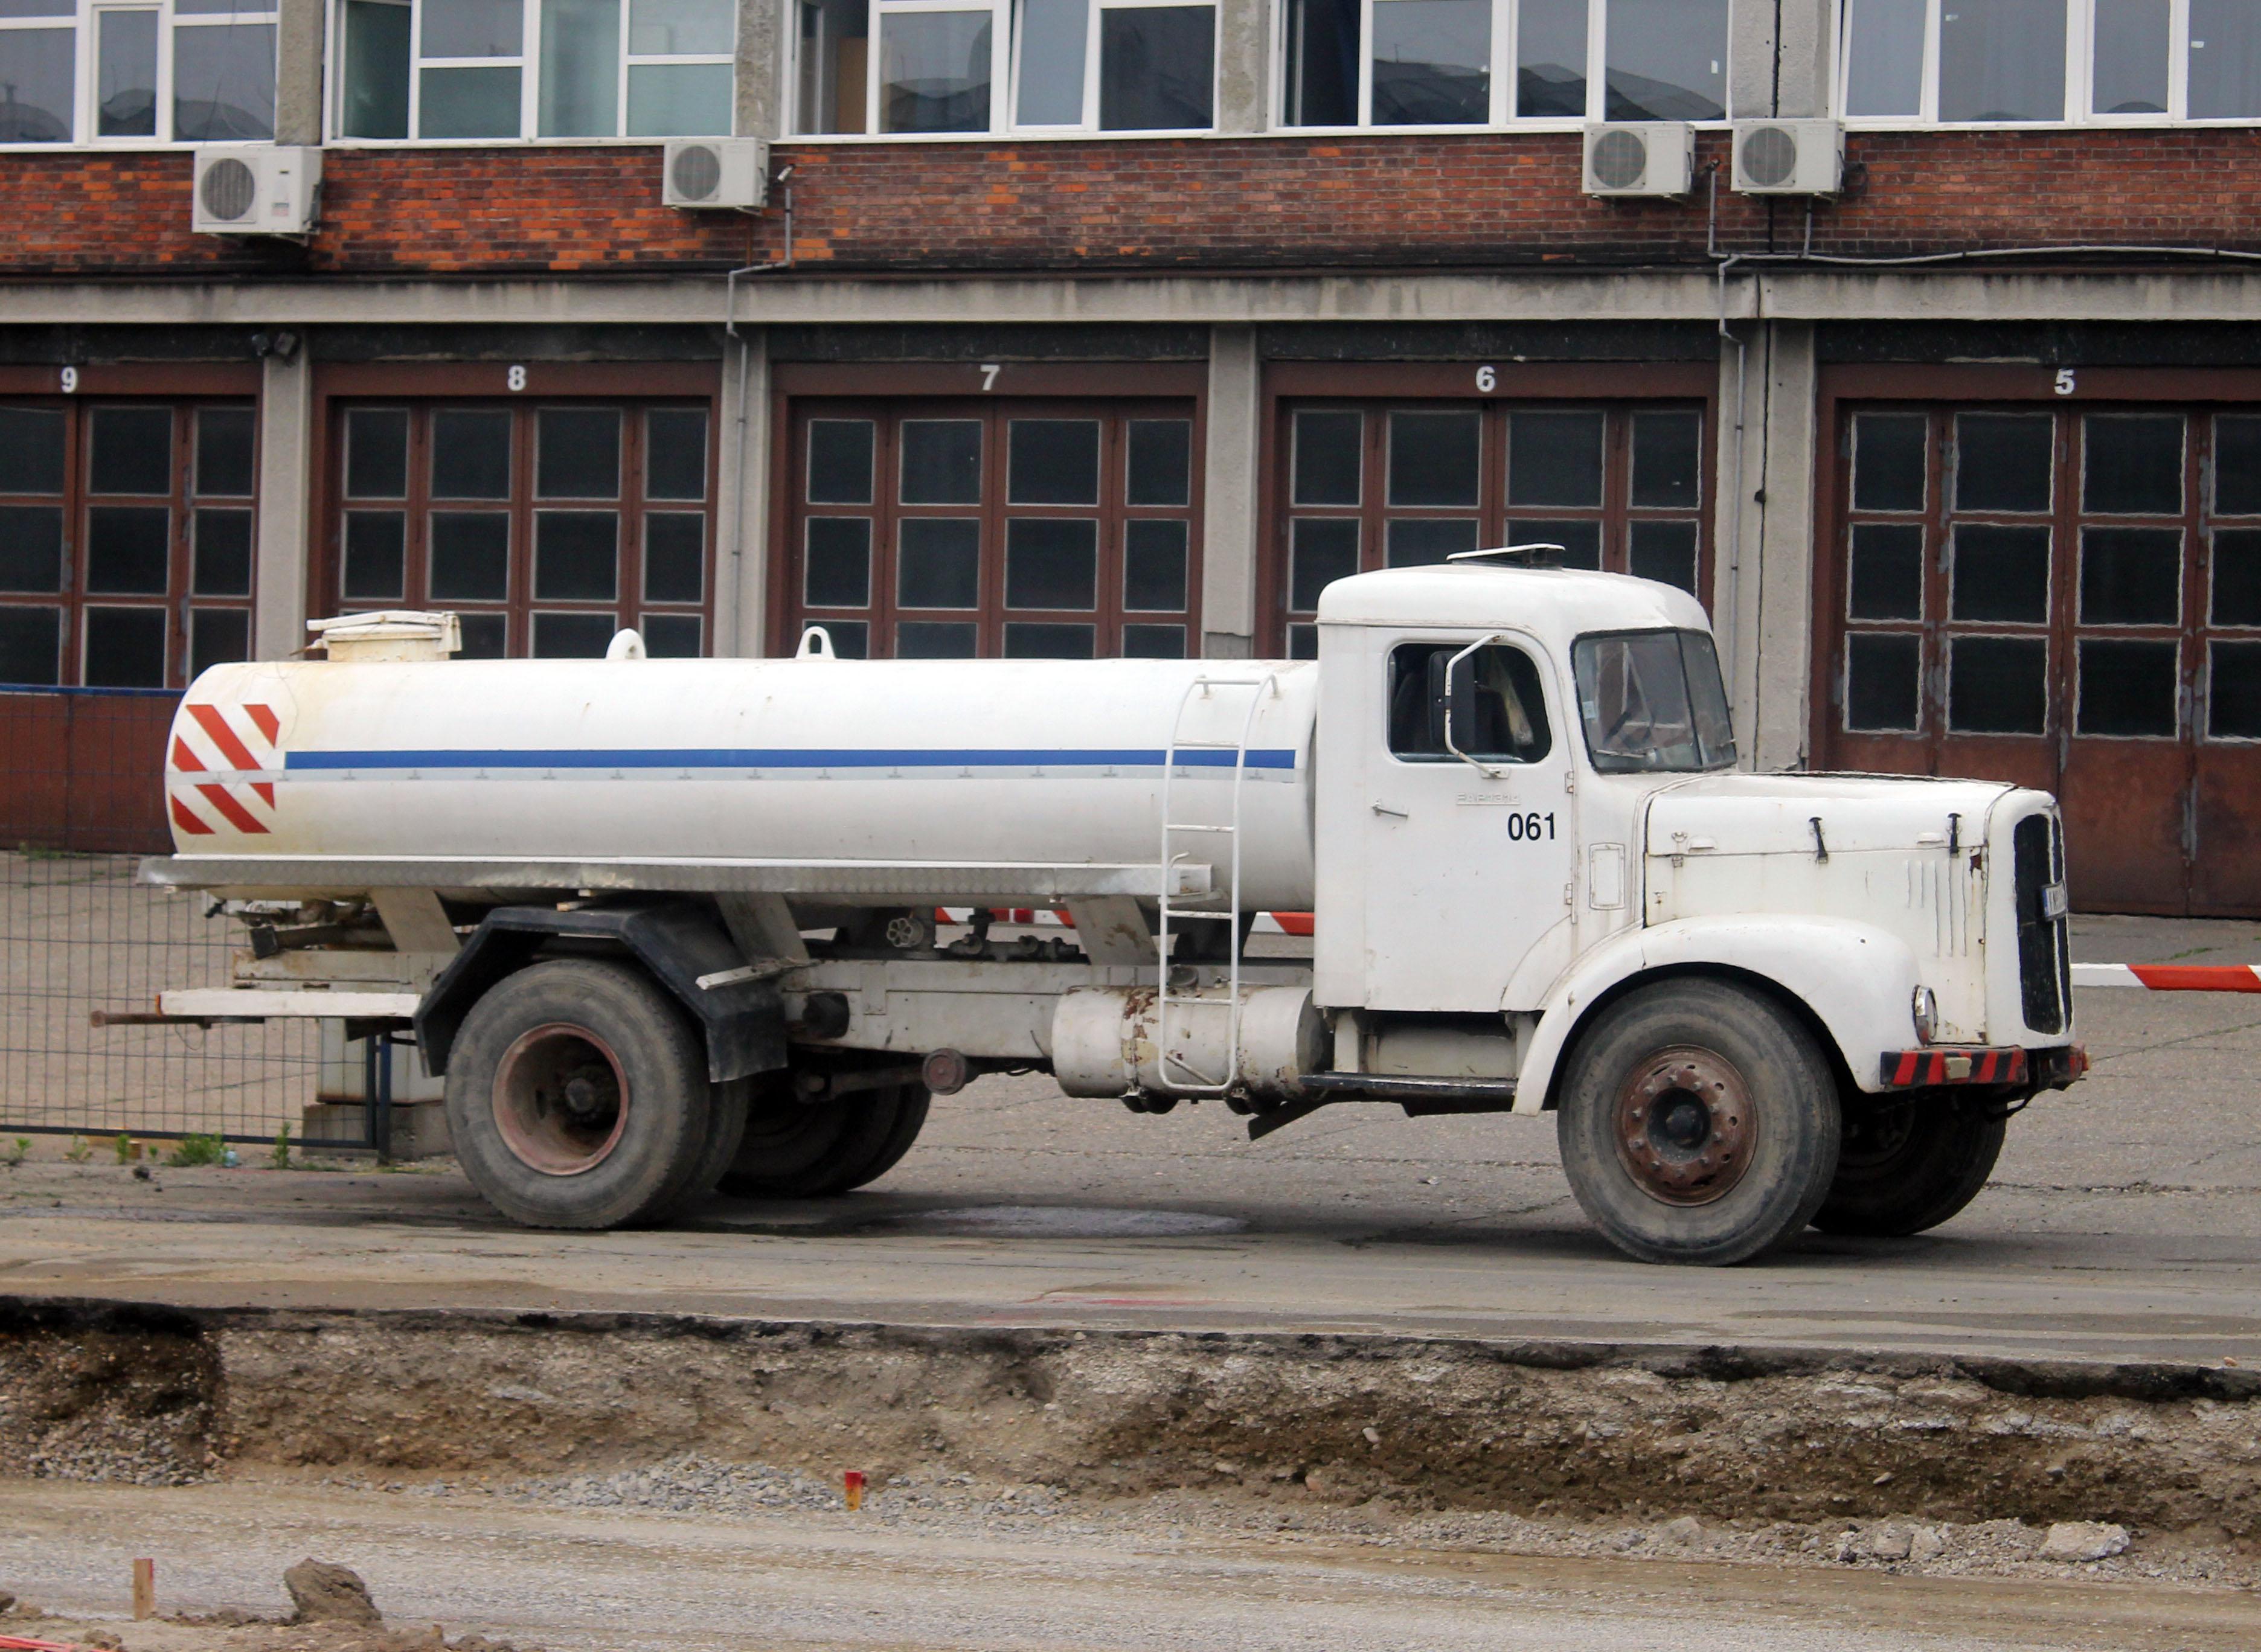 File:FAP 1314 cisterna1.jpg